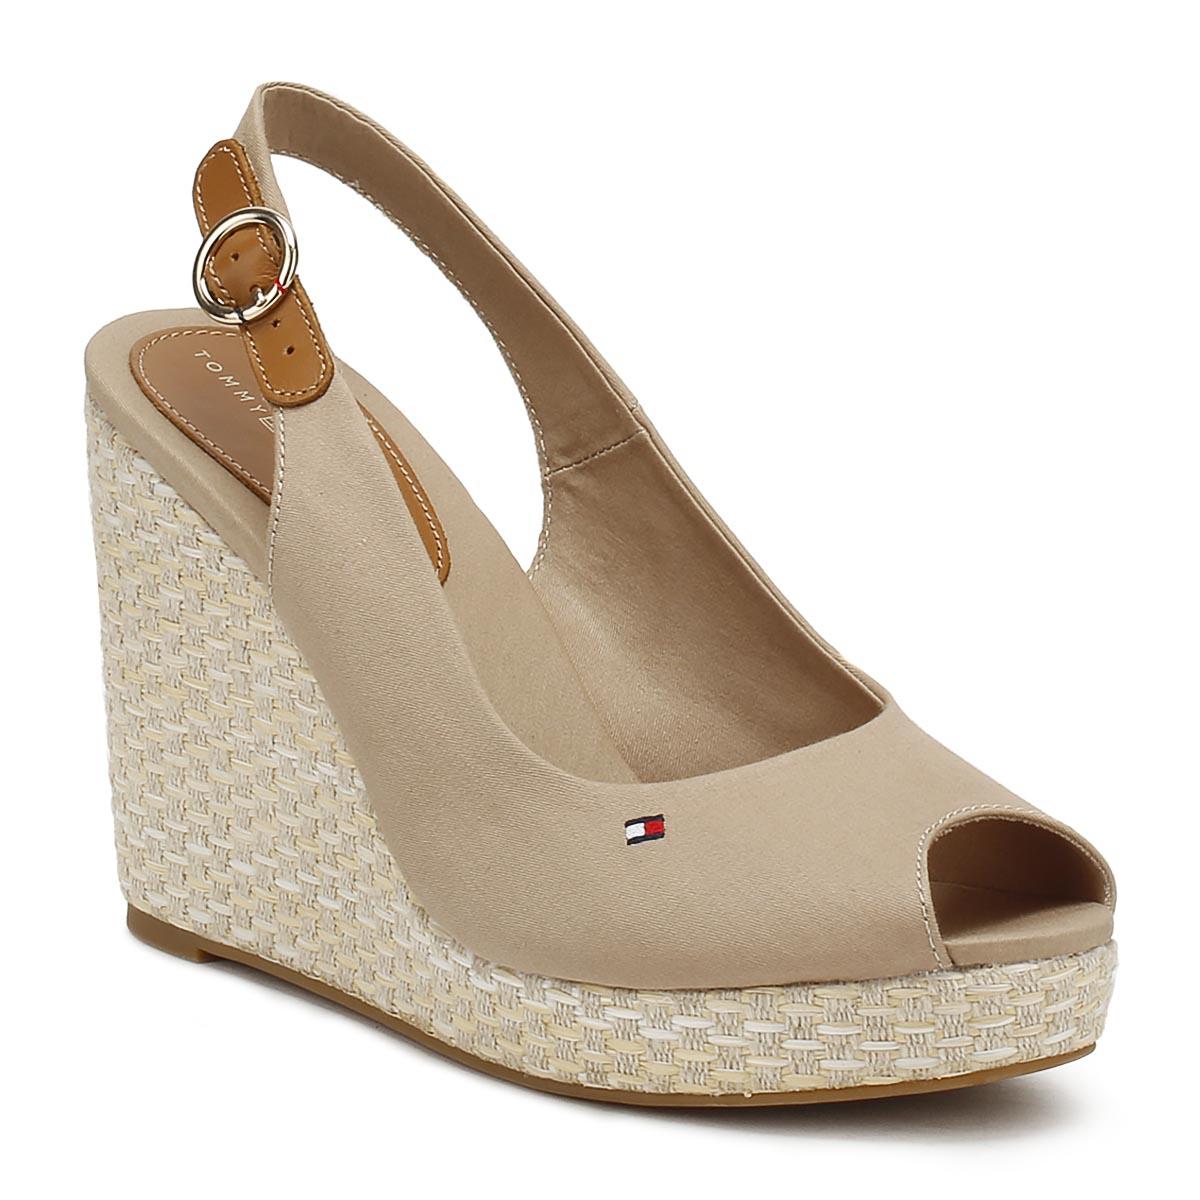 12a36c8d6 Tommy Hilfiger Womens Wedge Sandals Cobblestone Grey Elba Peep Toe ...